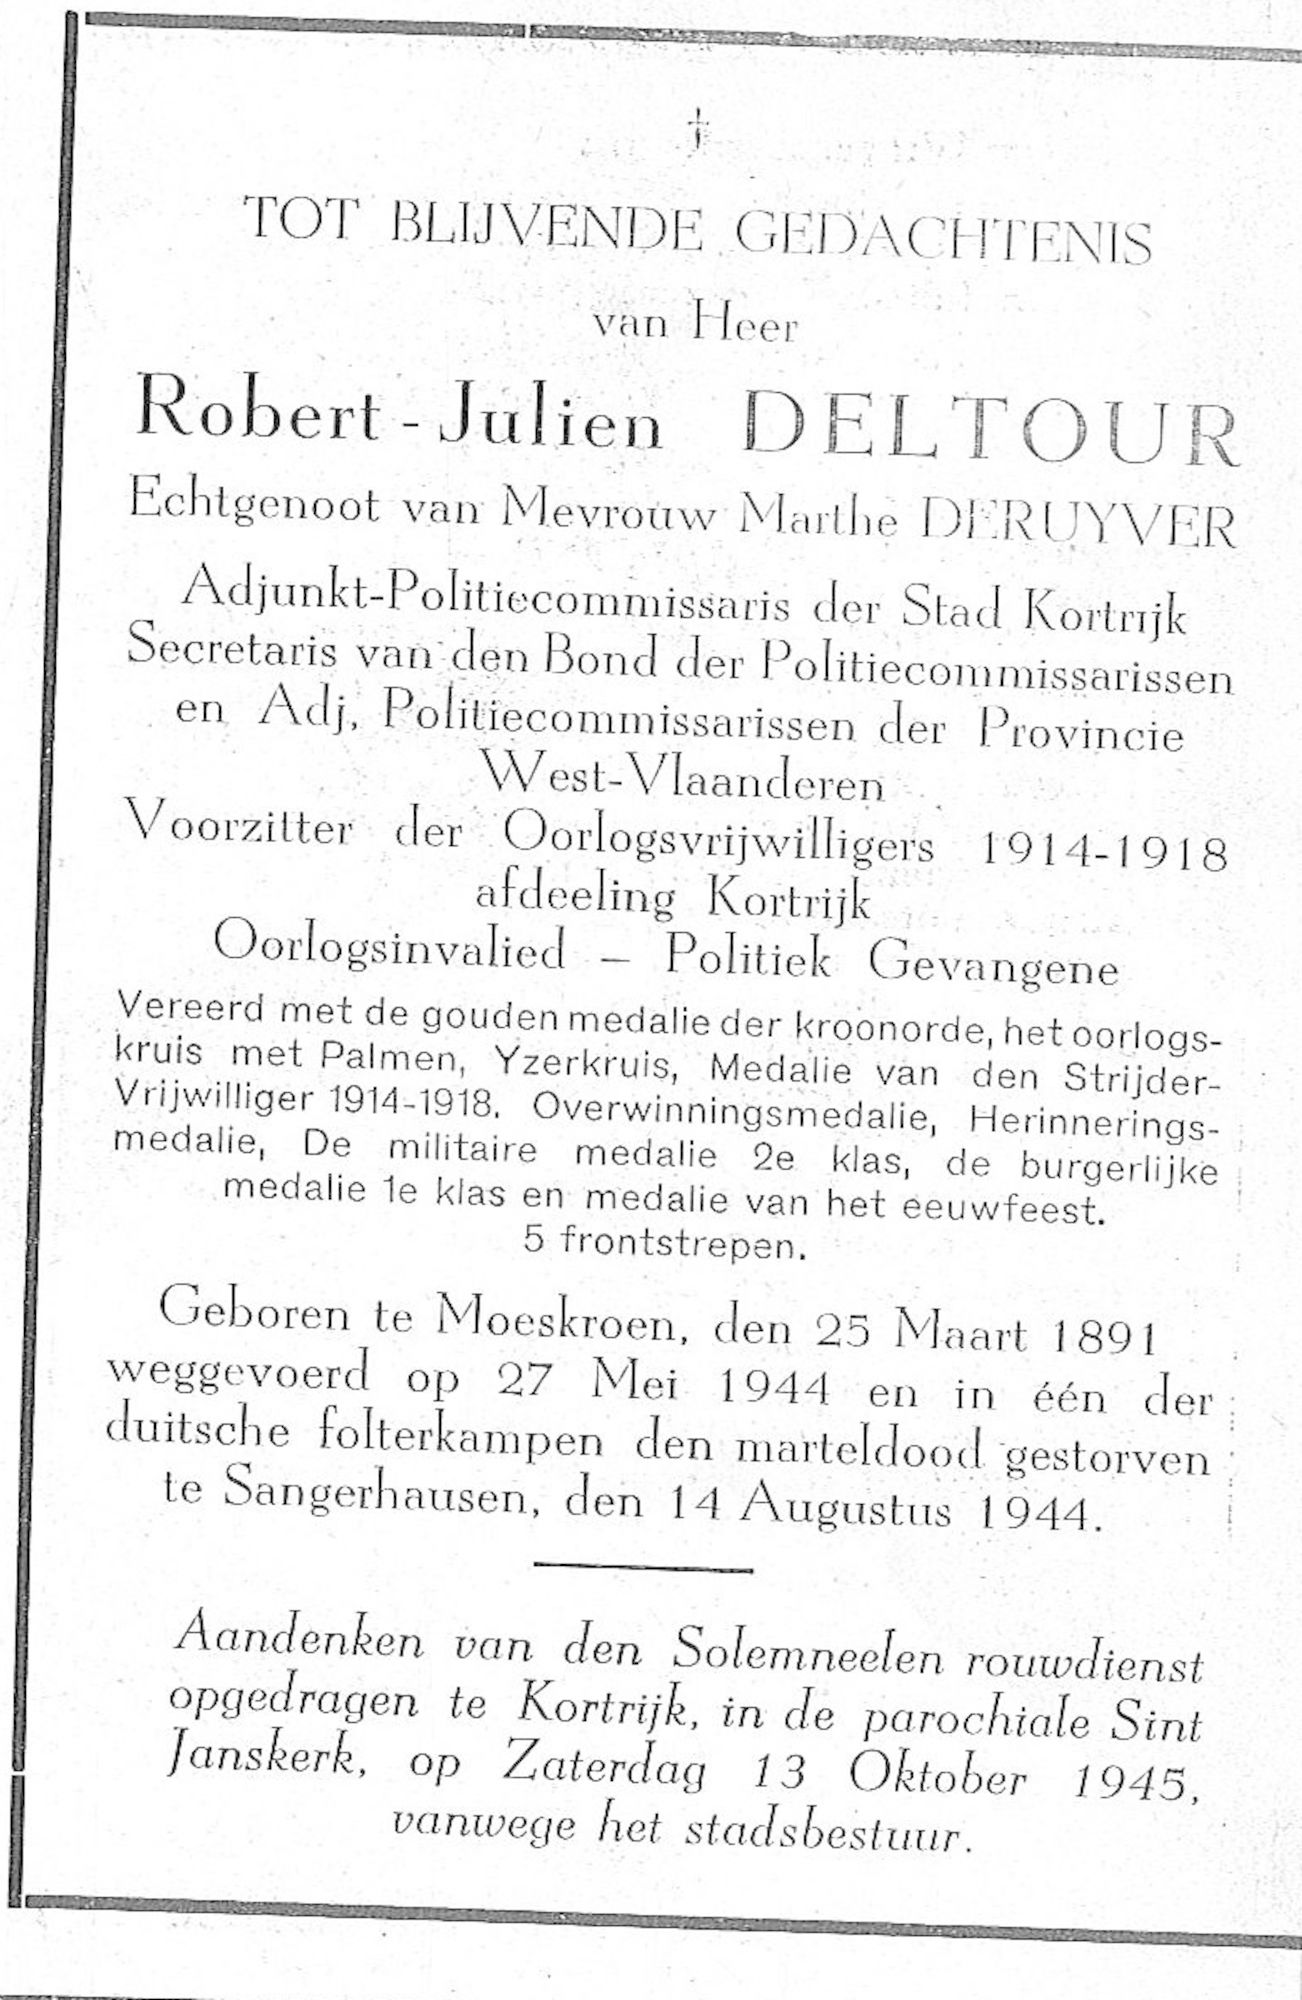 Robert-Julien Deltour